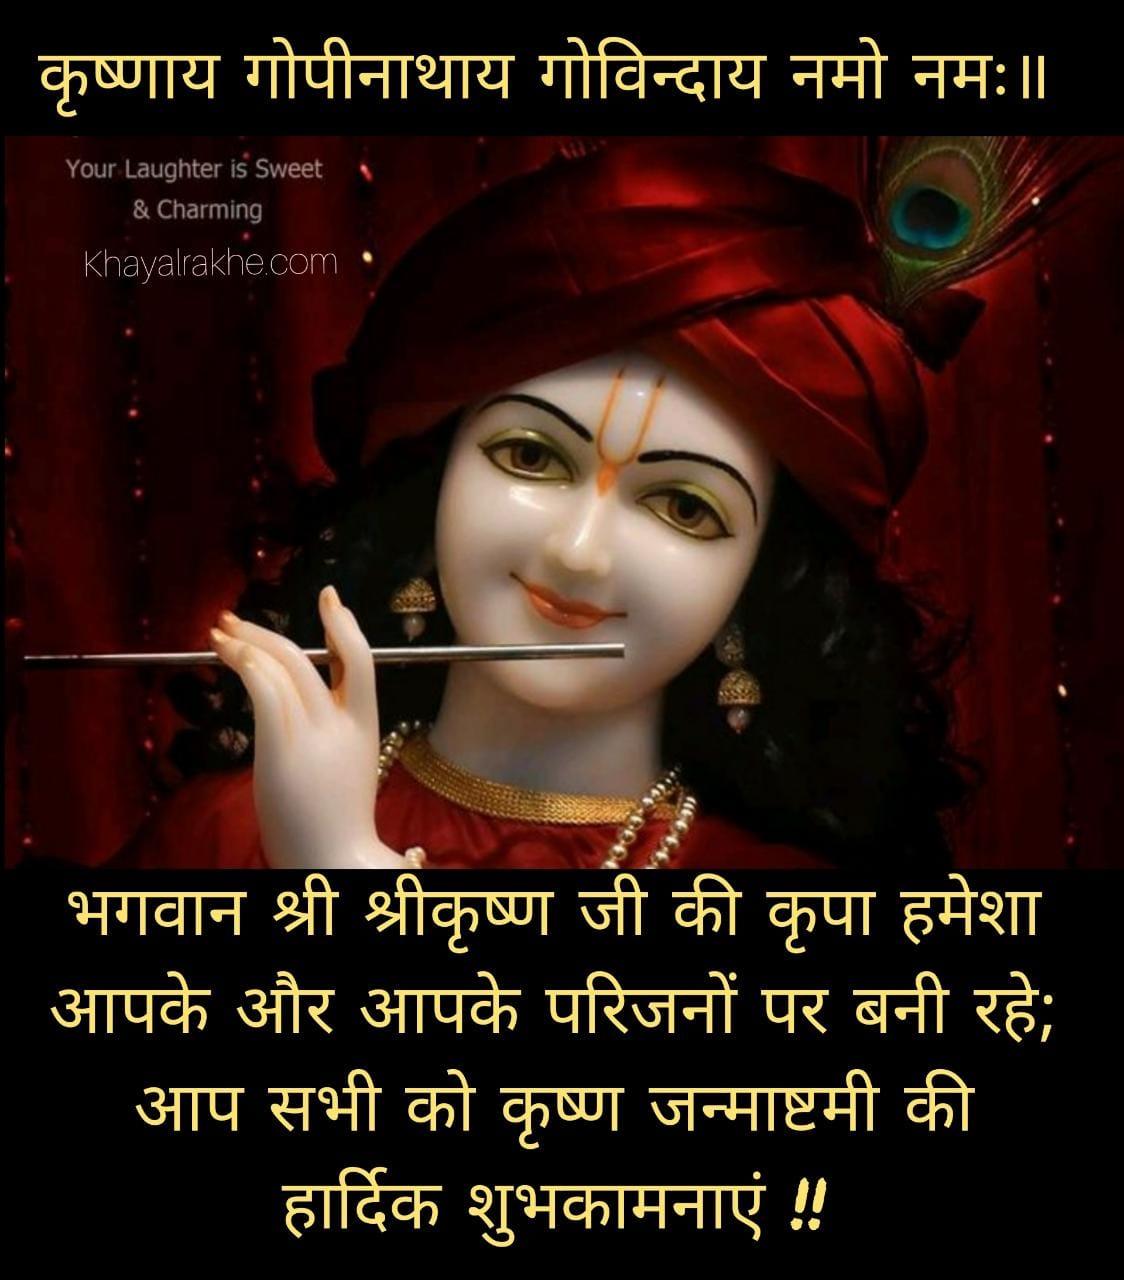 Happy Krishna Janmashtami Status in Hindi - Wishes